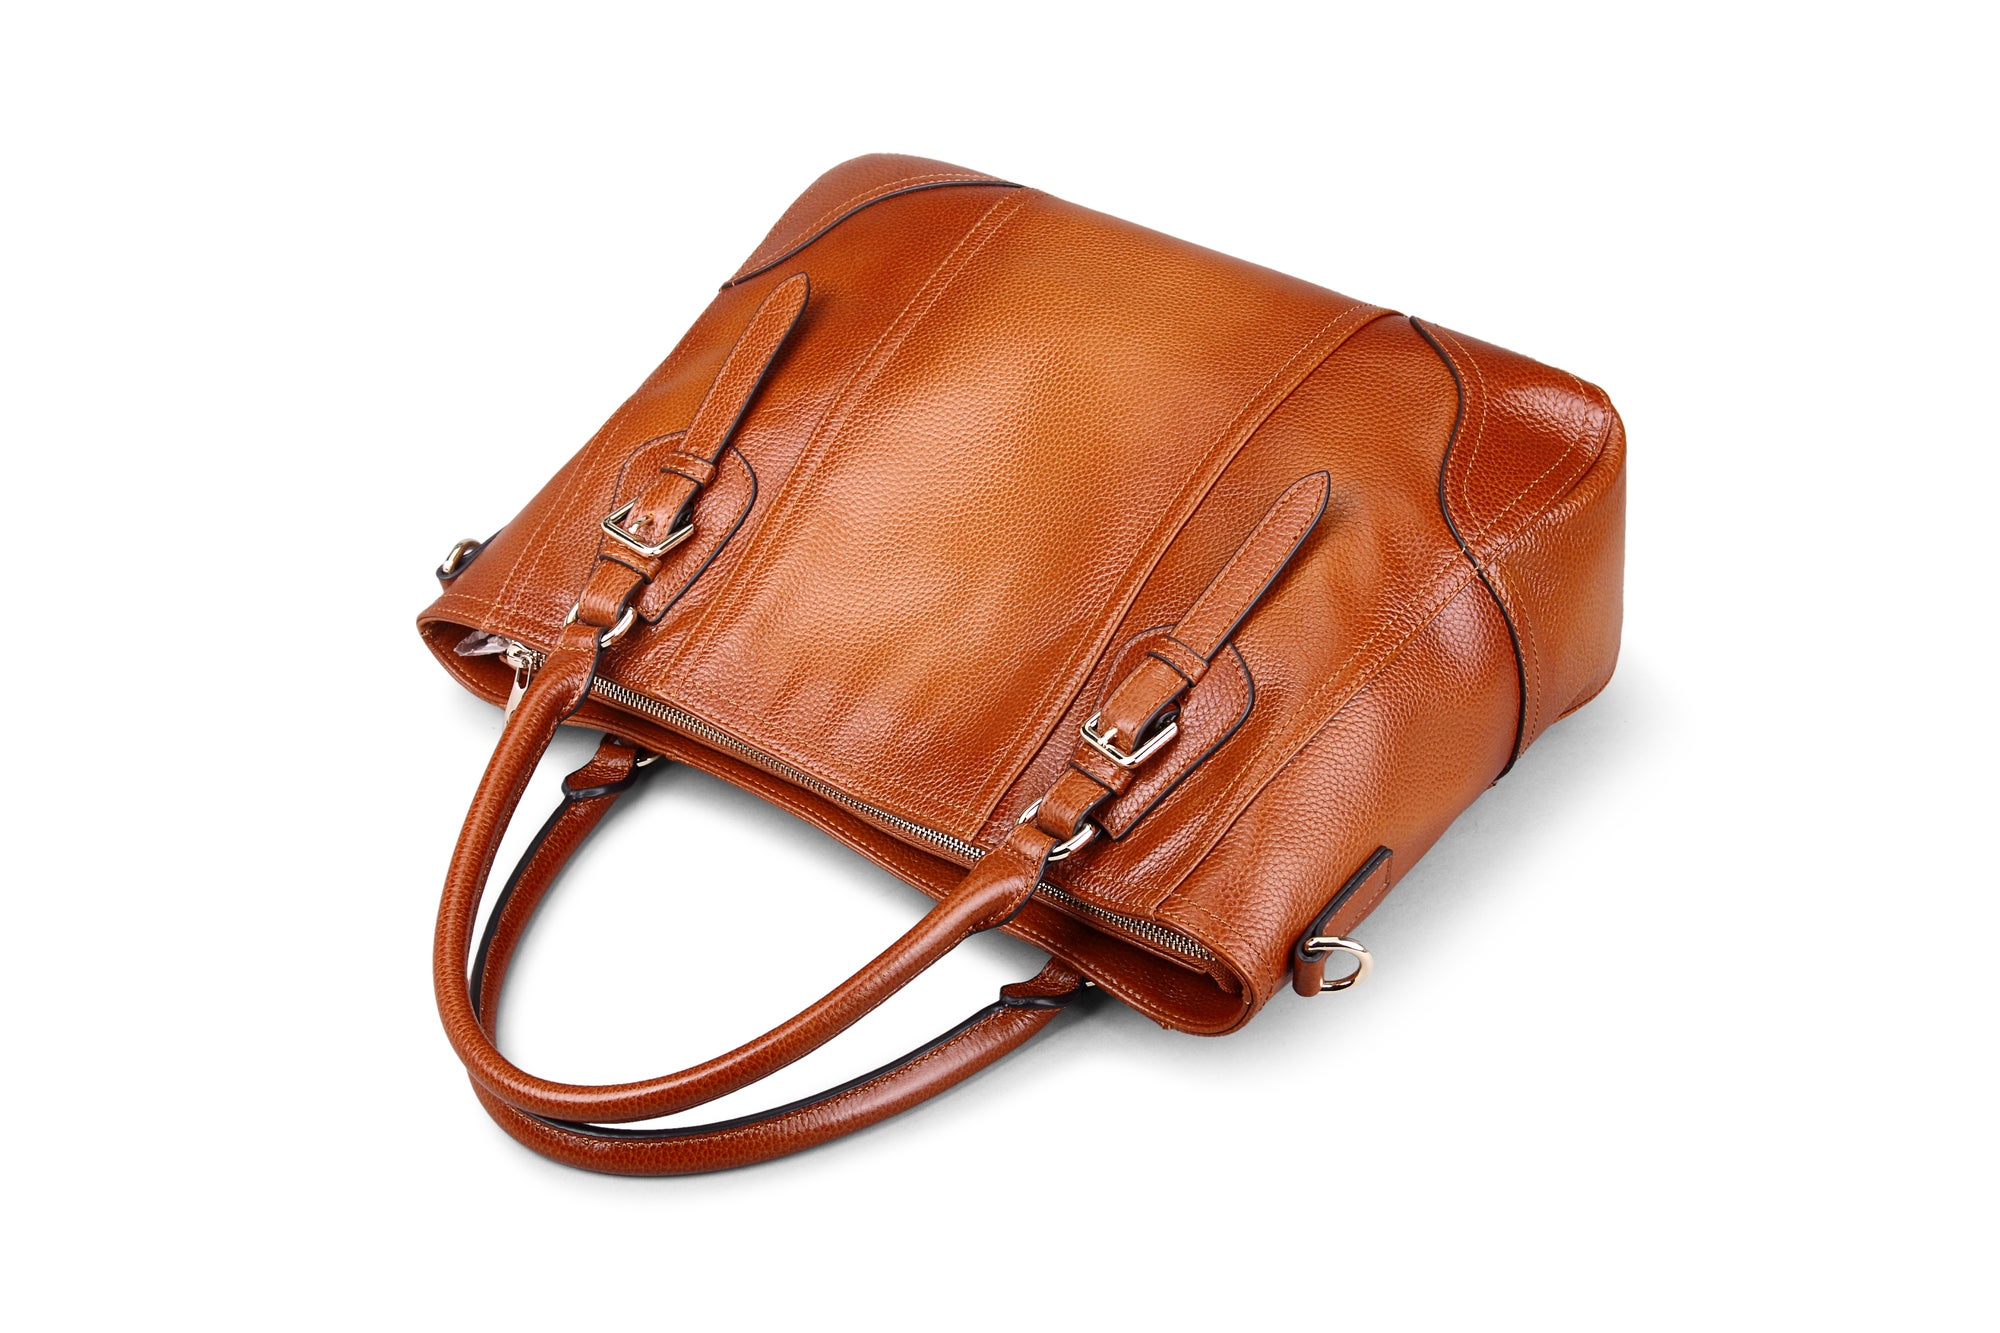 18f6b8b4c9 2 Colors Handmade Women Top Handle Handbags Satchel Shoulder Bag for Lady  Purse Tote Bag SL9290